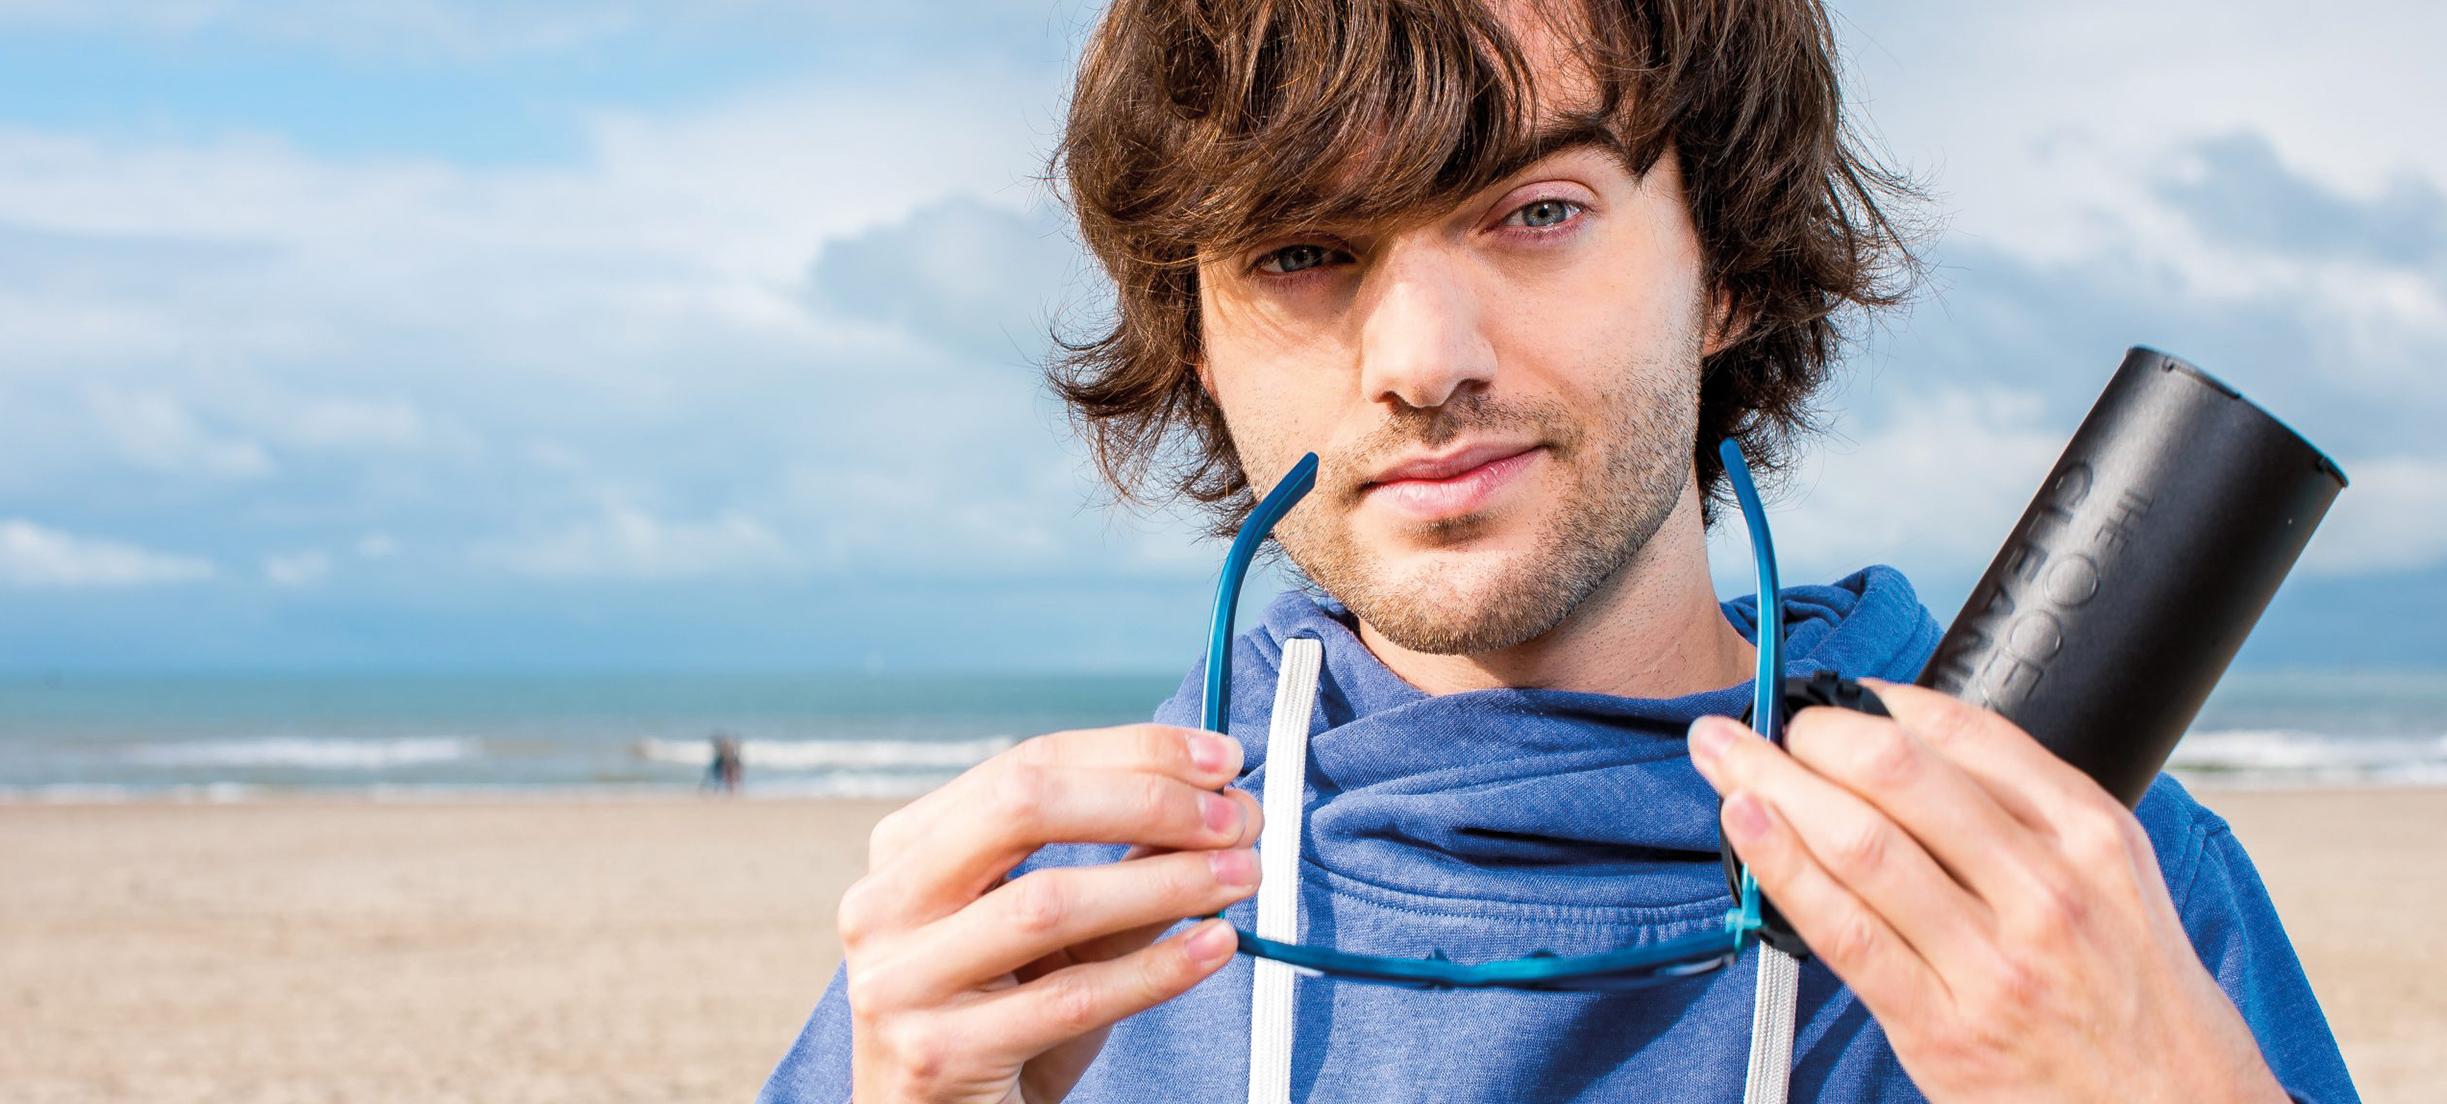 Boyan Slat lanceert eerste product van Ocean Cleanup-plastic